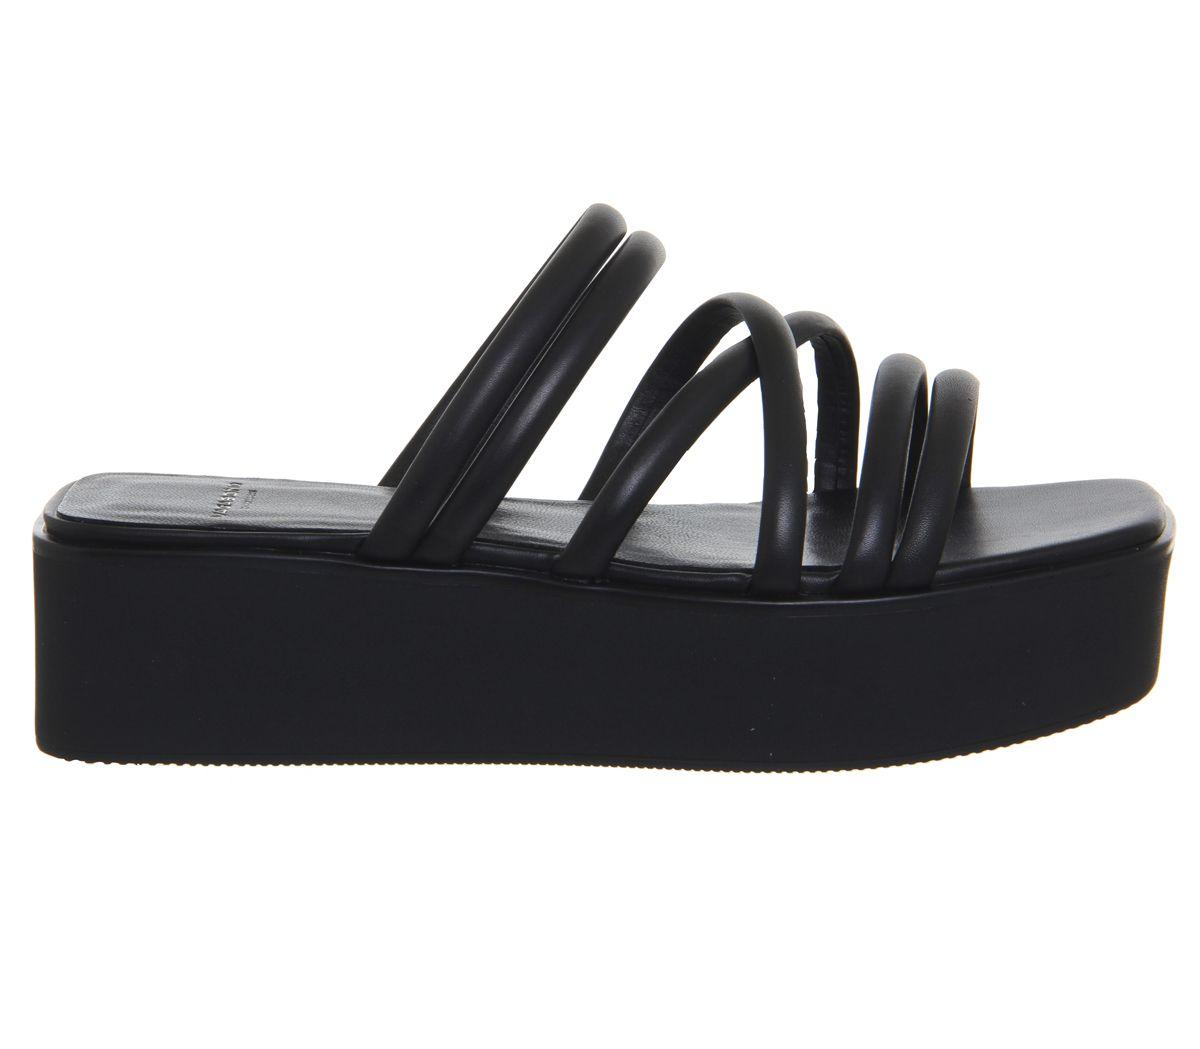 db3c1559f4c Sentinel Womens Vagabond Bonnie Wedges Black Sandals